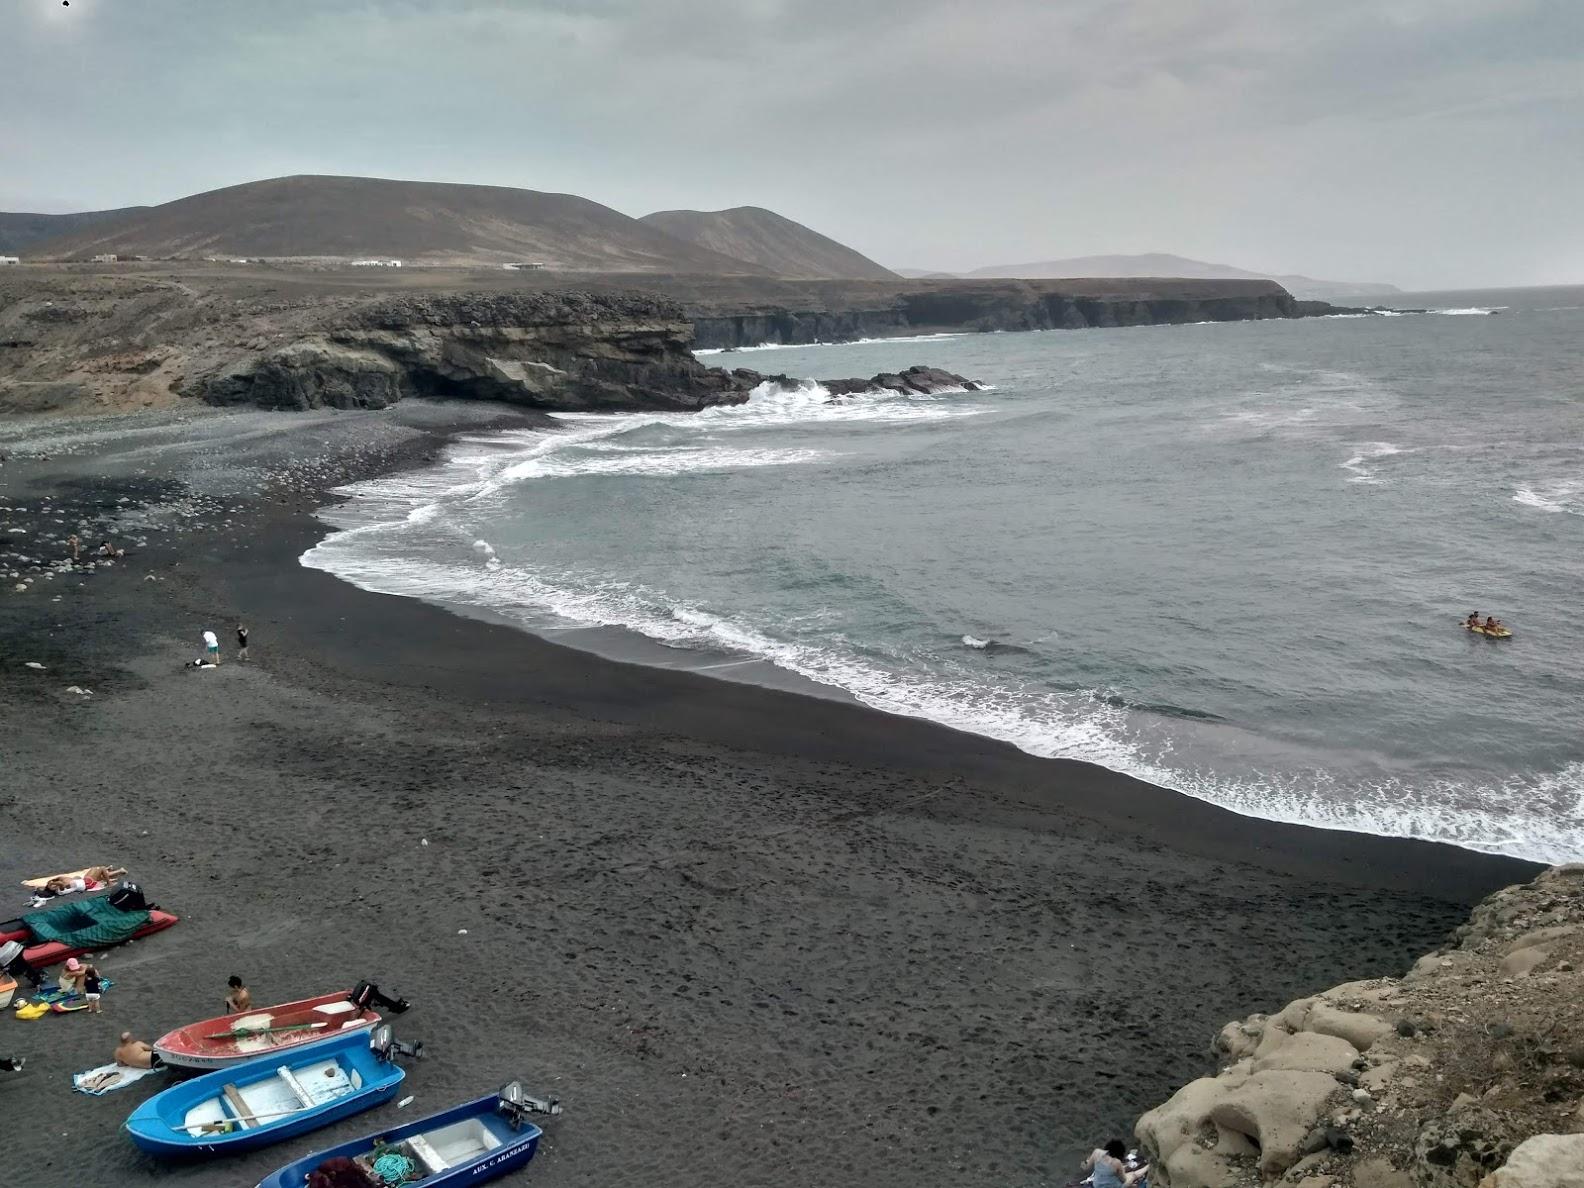 Vista panorámica de la playa de Ajuy